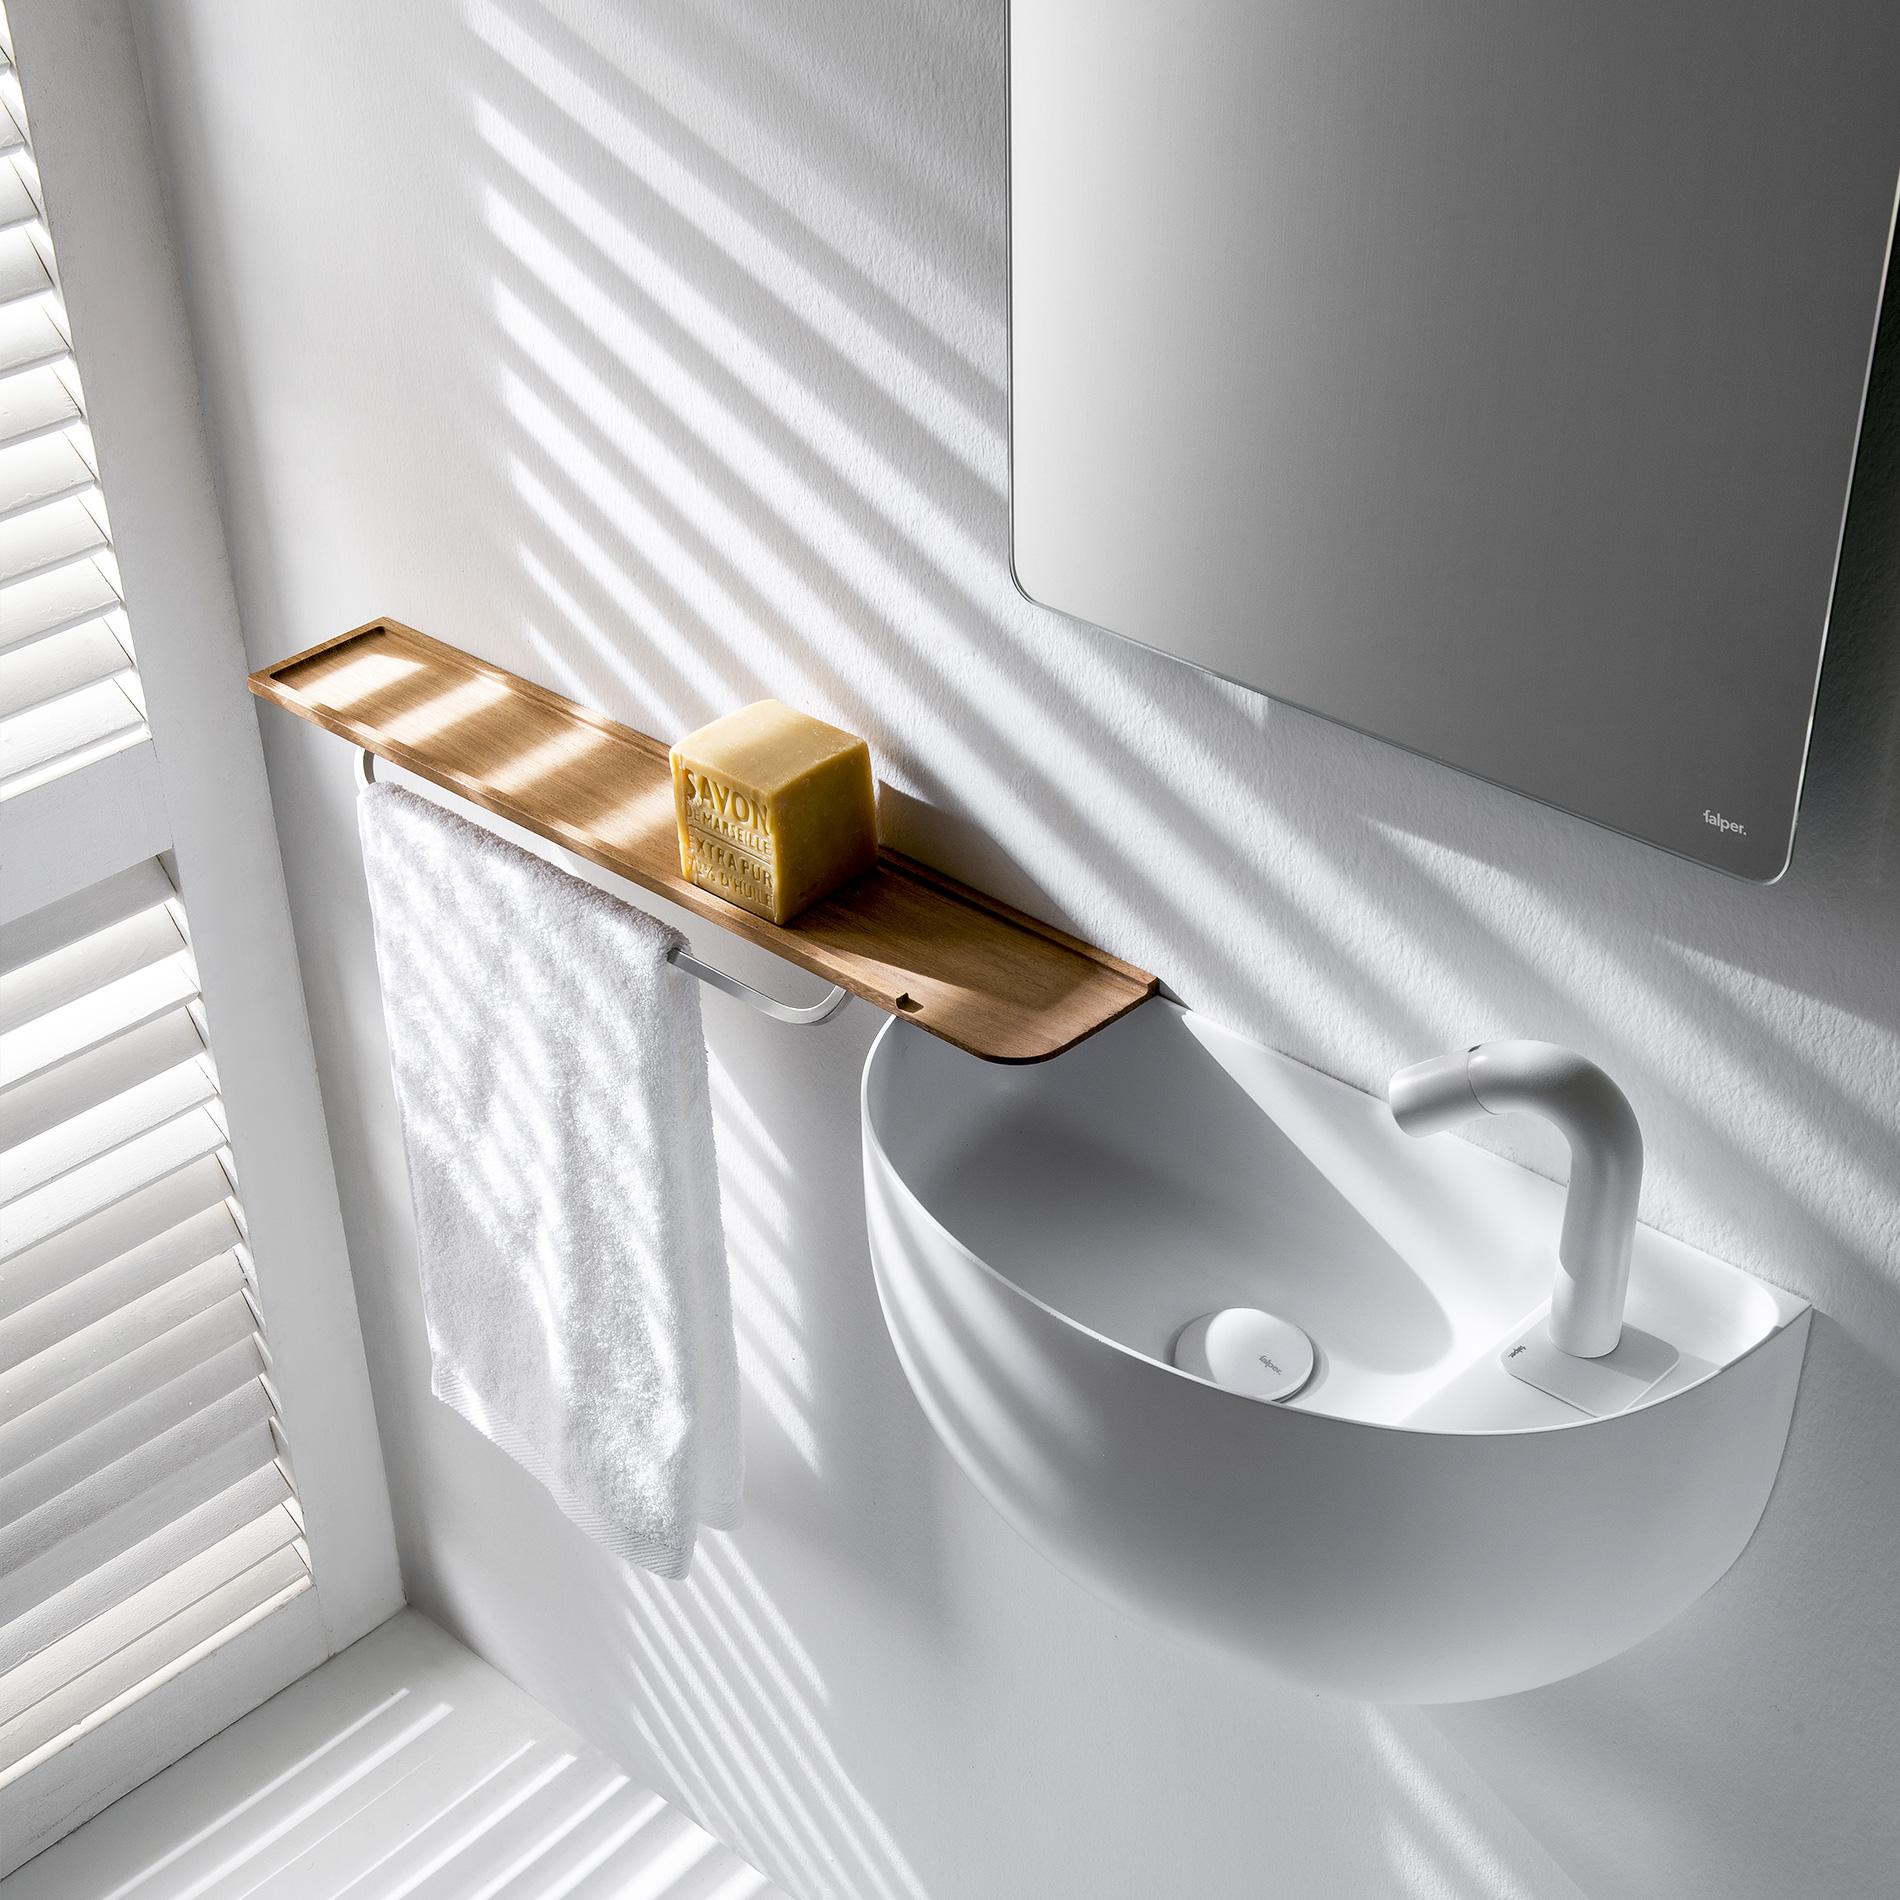 Nicos-International-home-products-Falper-washbasins-1